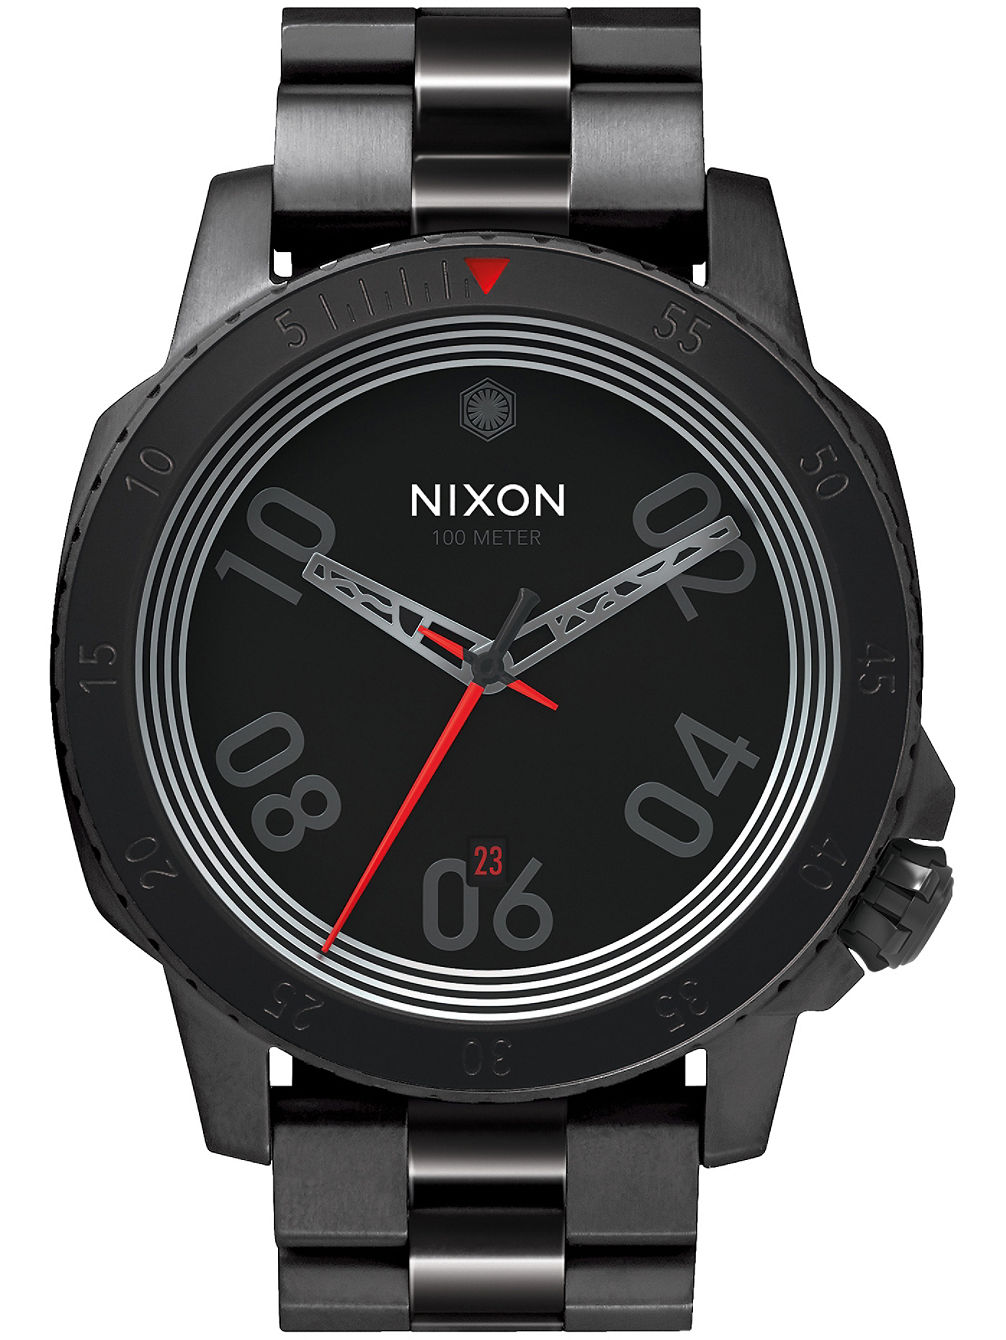 nixon the ranger star wars uhr online kaufen bei blue. Black Bedroom Furniture Sets. Home Design Ideas